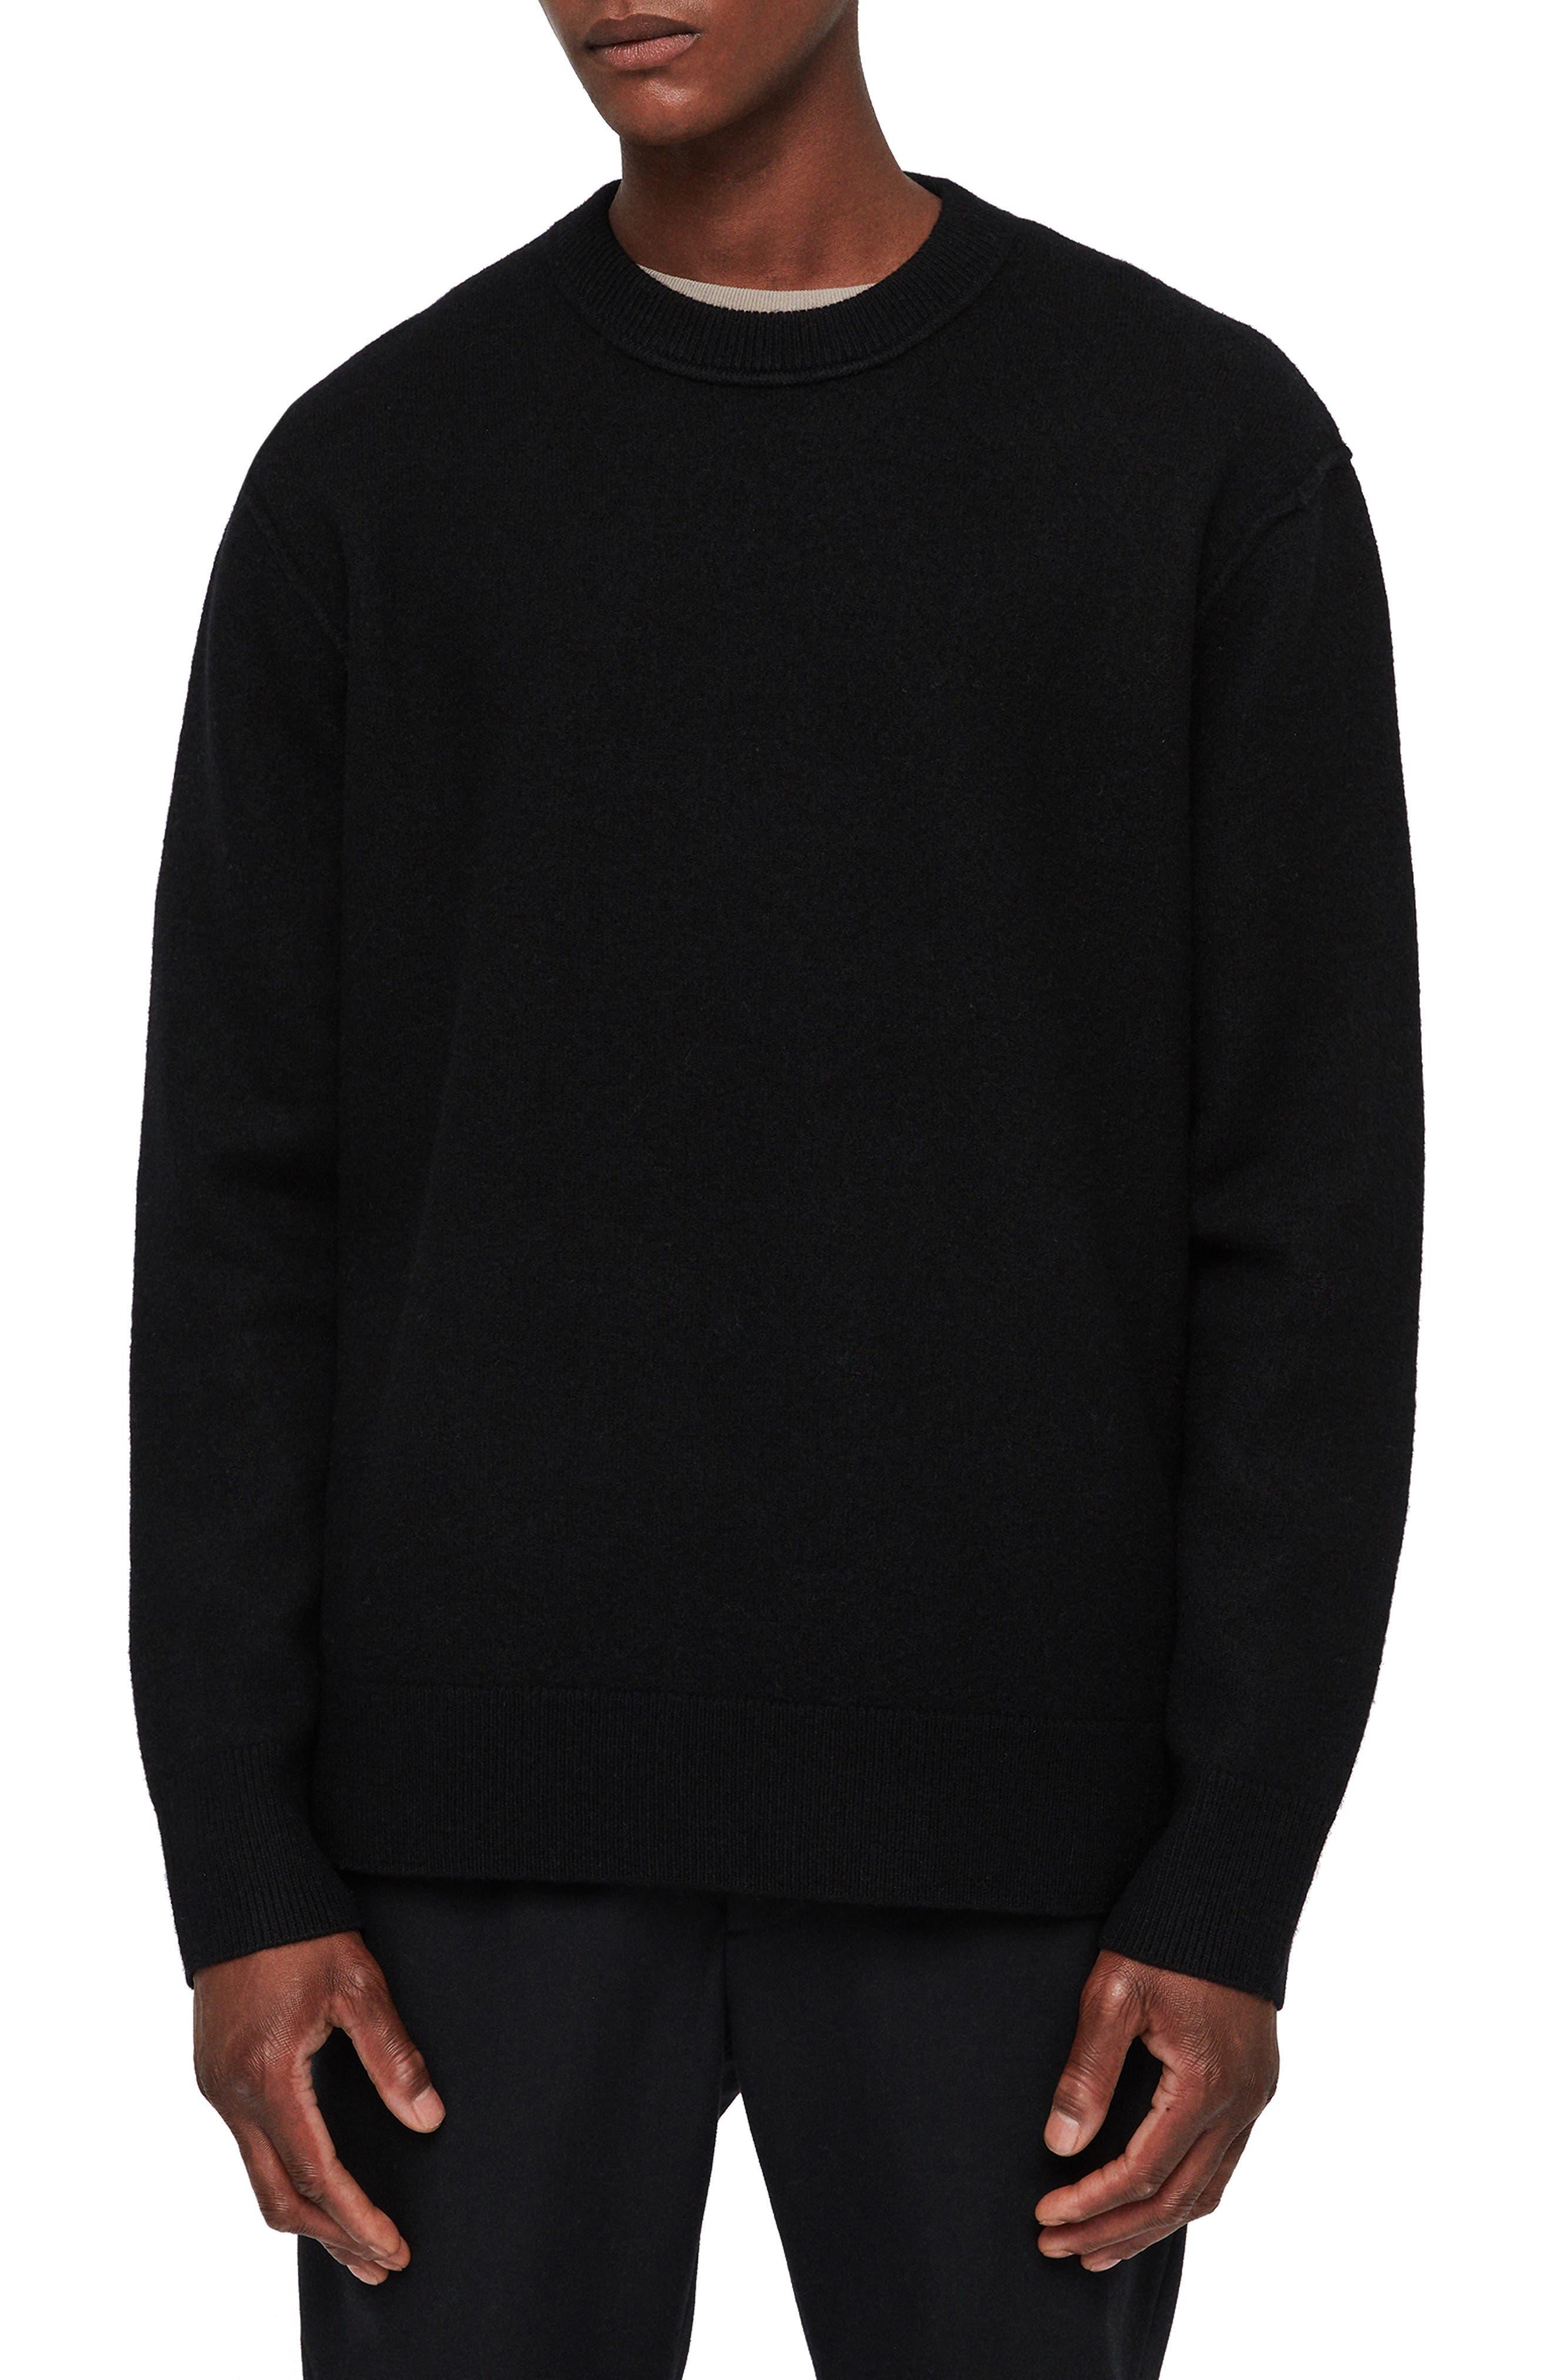 Maine Regular Fit Wool Sweater,                             Main thumbnail 1, color,                             BLACK